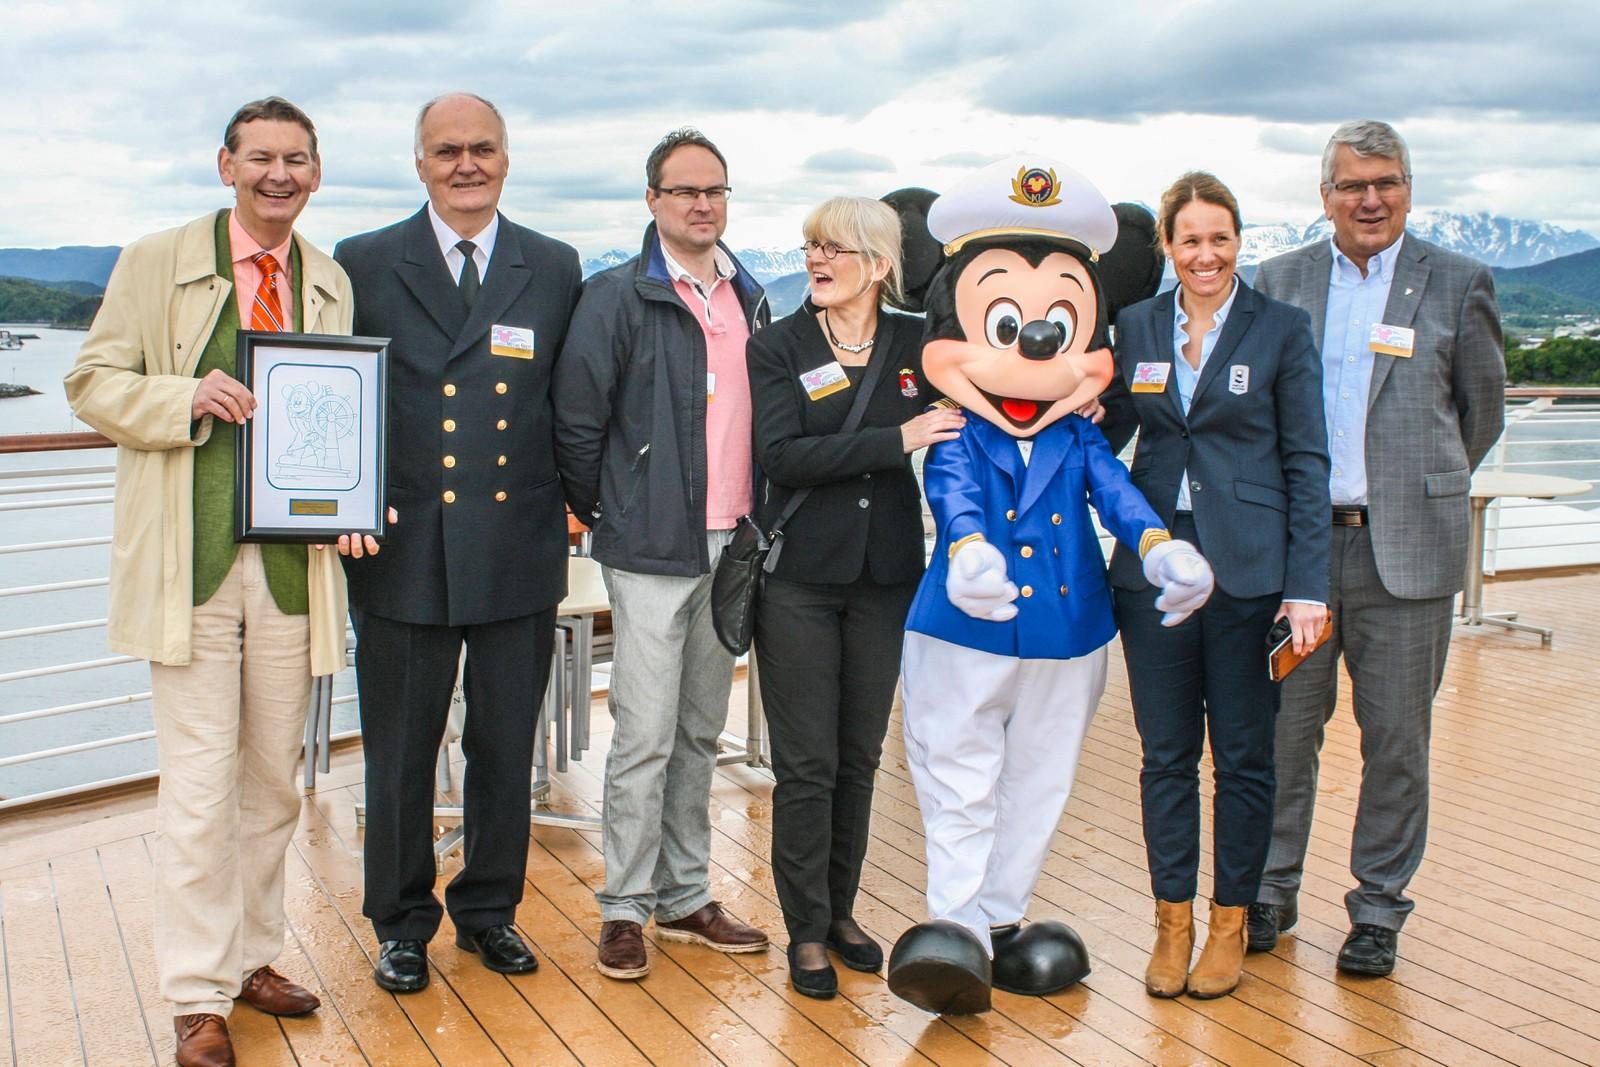 Mikke Mus sammen med ordføreren i Ålesund, havnesjefen, Bente Saxon og ordføreren i Giske kommune, Knut Støbakk.